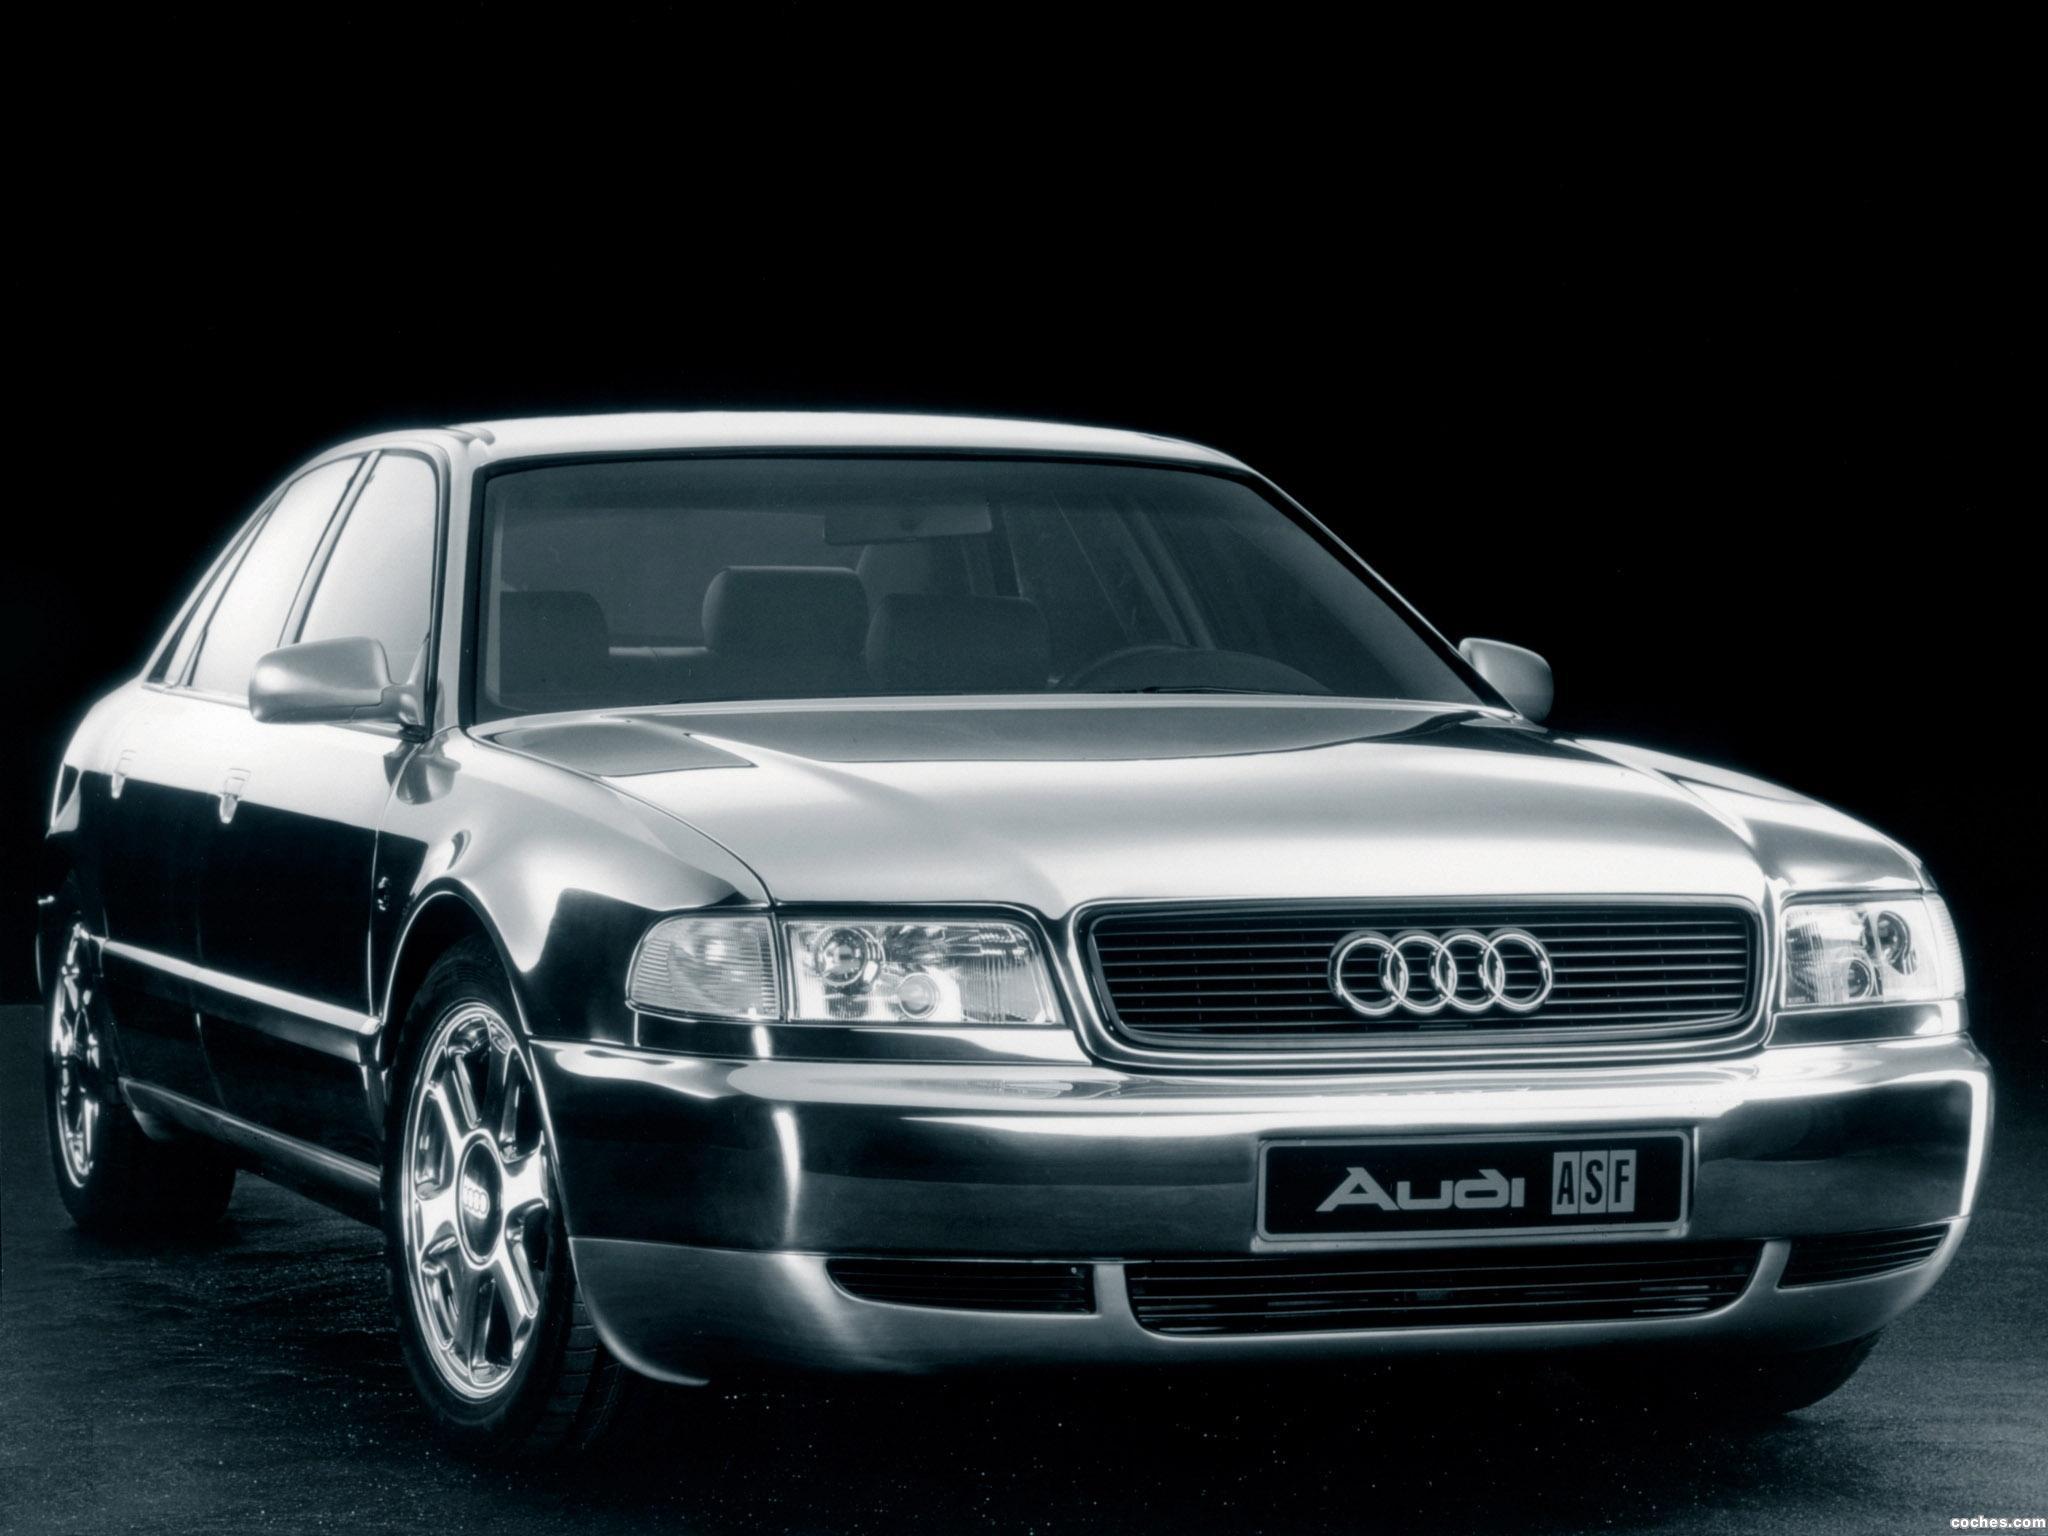 Foto 0 de Audi ASF Concept 1993